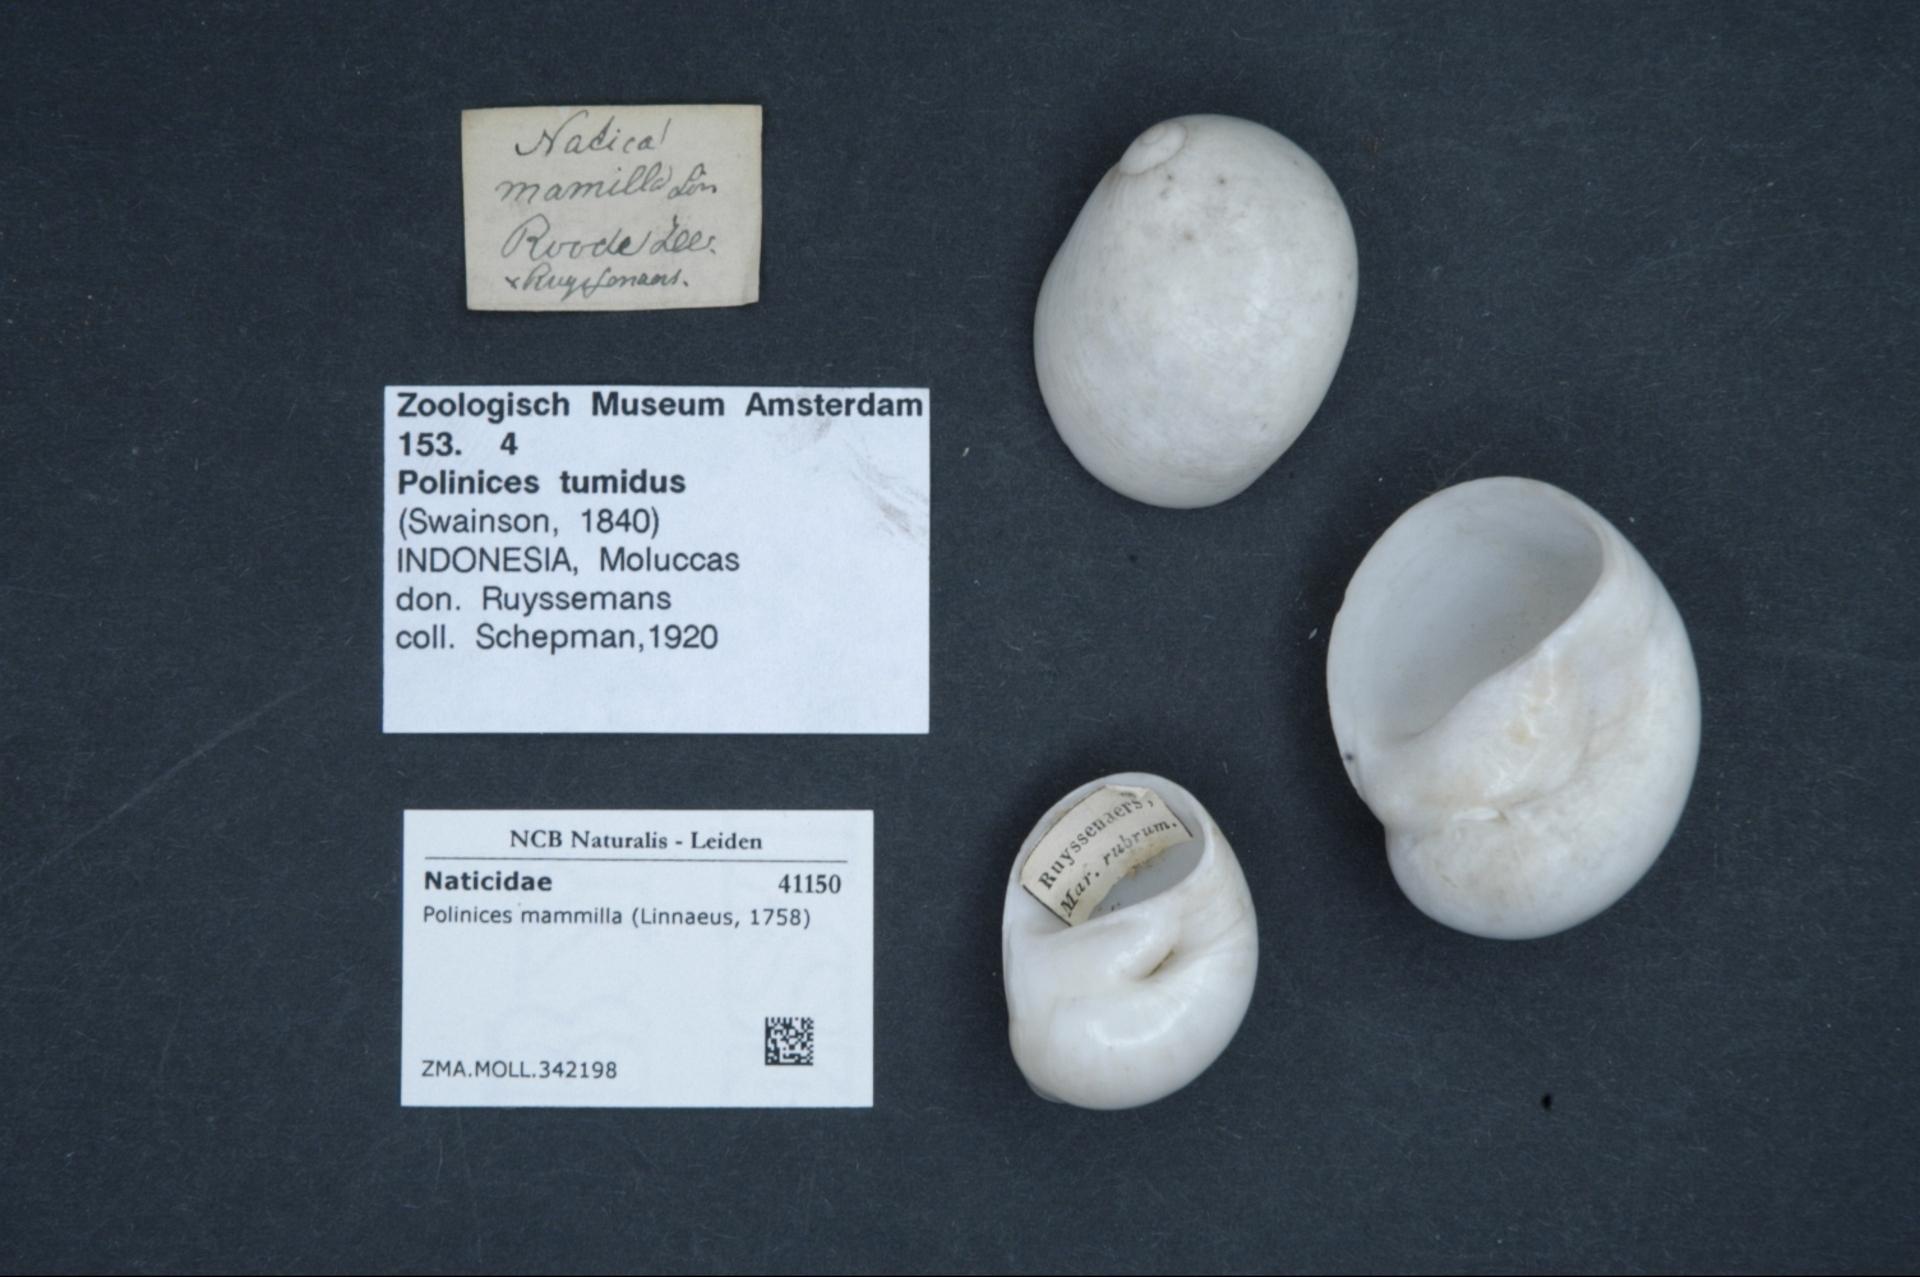 ZMA.MOLL.342198 | Polinices mammilla (Linnaeus, 1758)